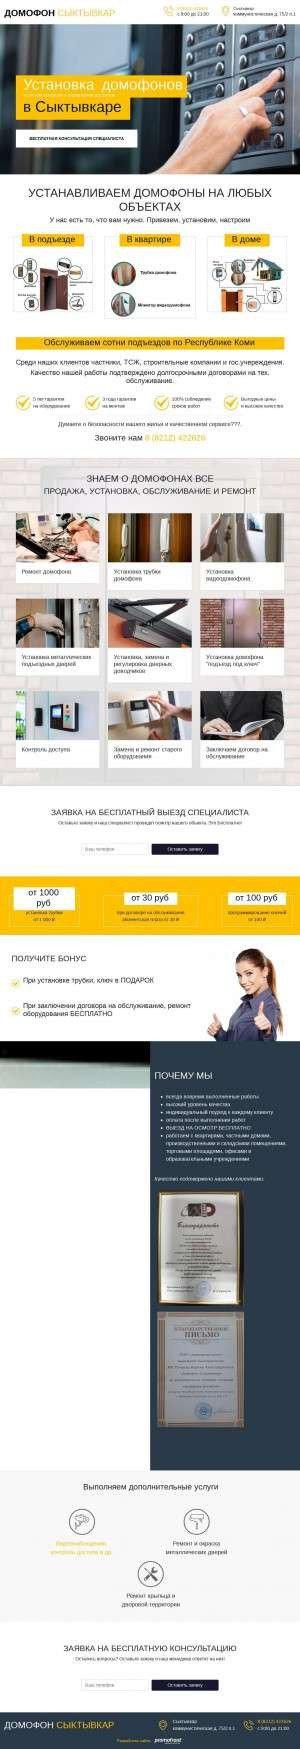 Предпросмотр для domofon-syktyvkar.ru — Домофон-Сыктывкар